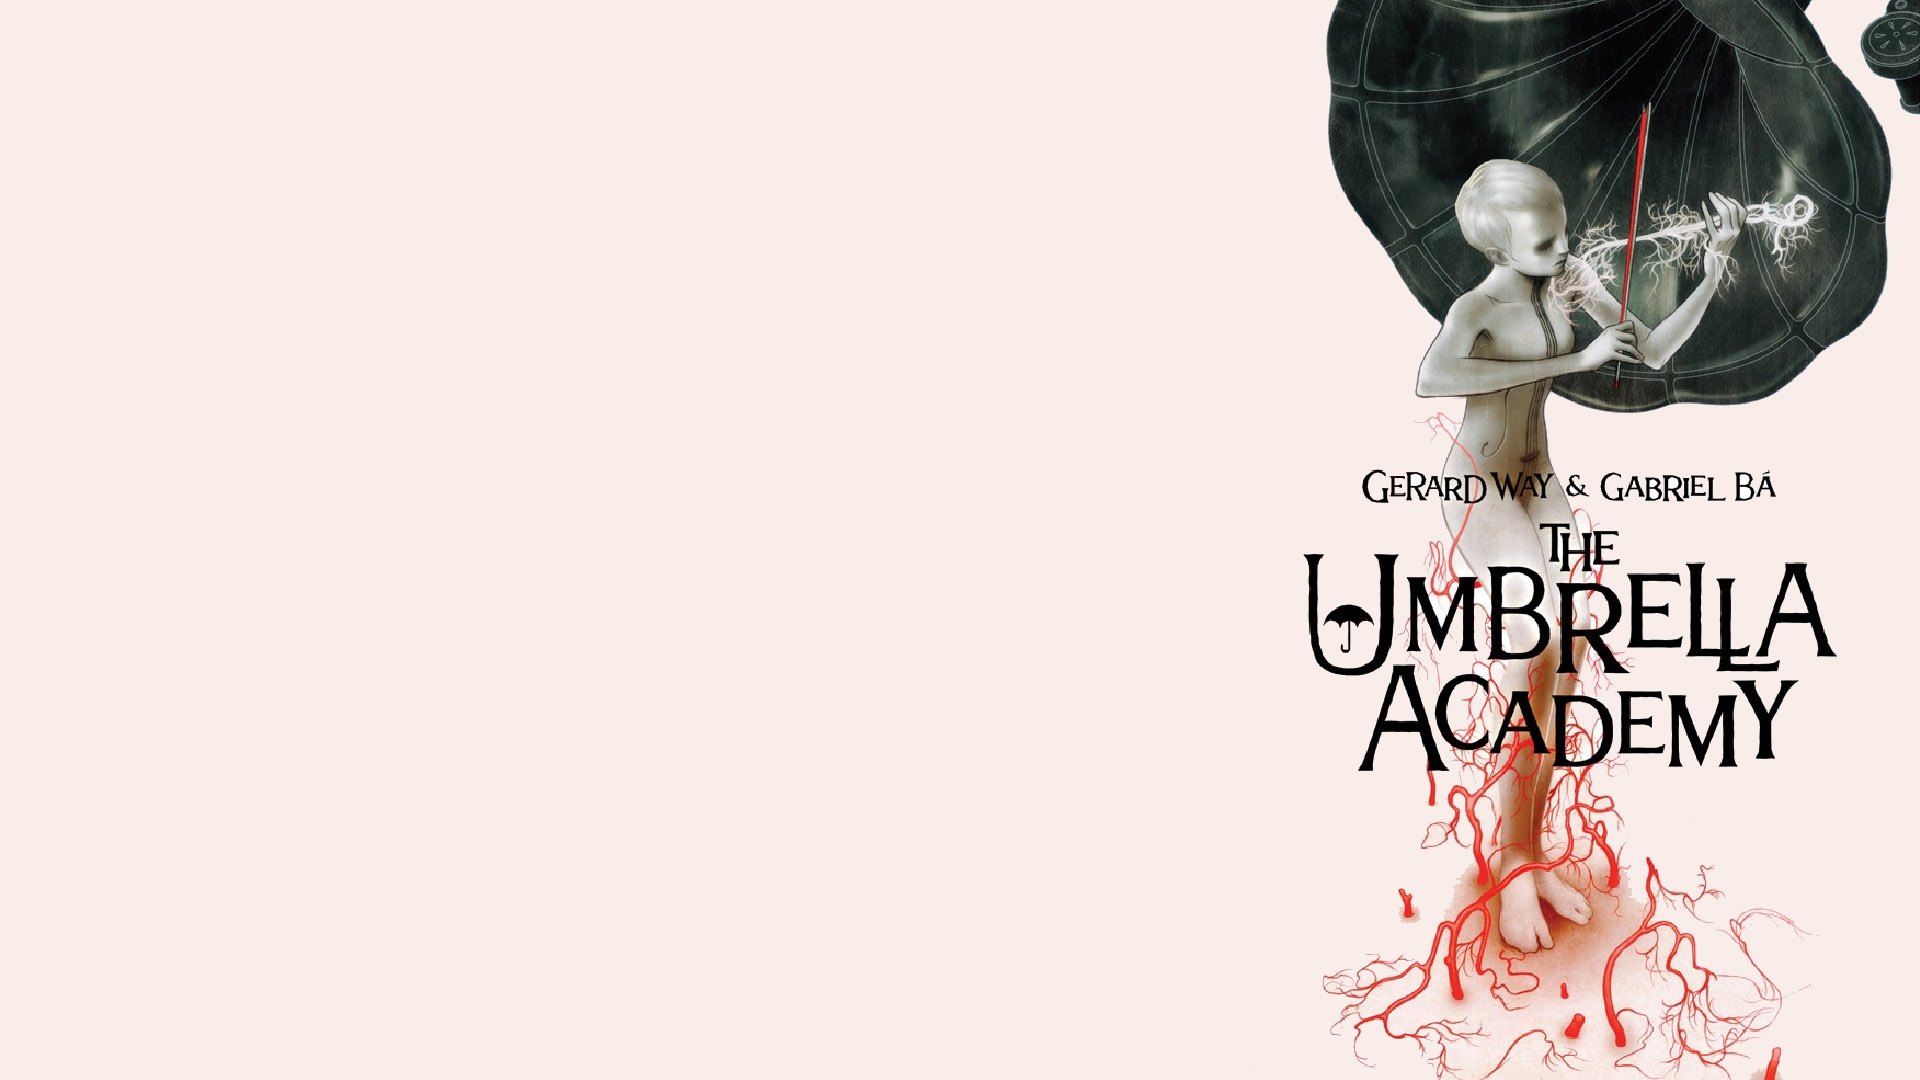 The Umbrella Academy HD Wallpaper | Background Image ...